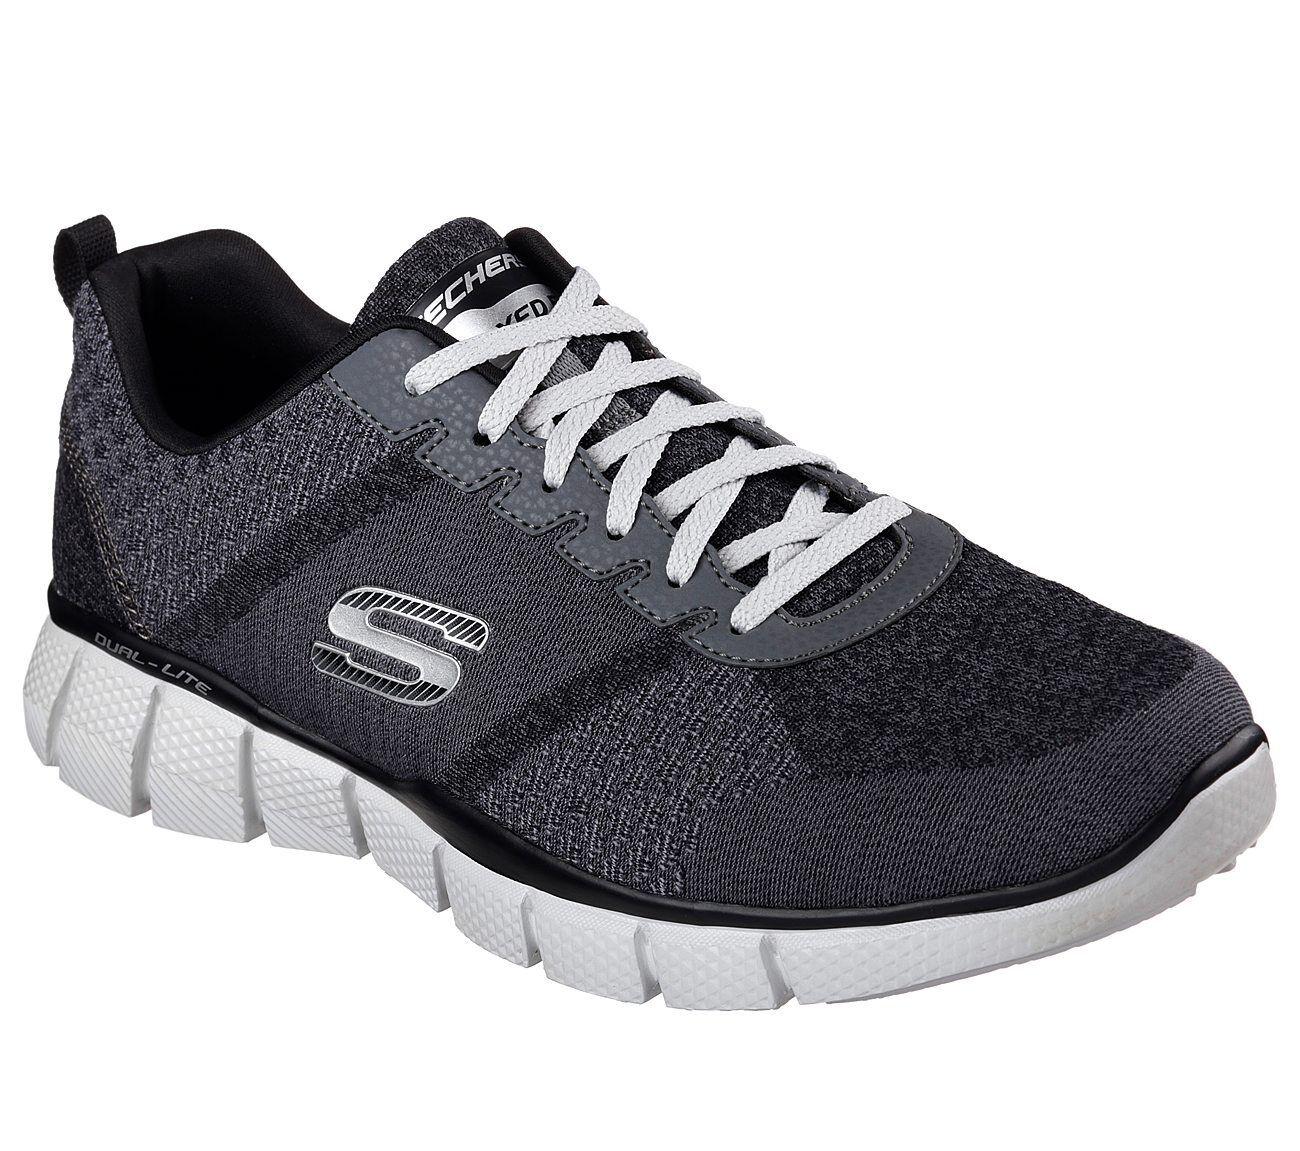 Men's Skechers EQUALIZER 2.0 - TRUE BALANCE 51530 CCBK Cheap women's shoes women's shoes